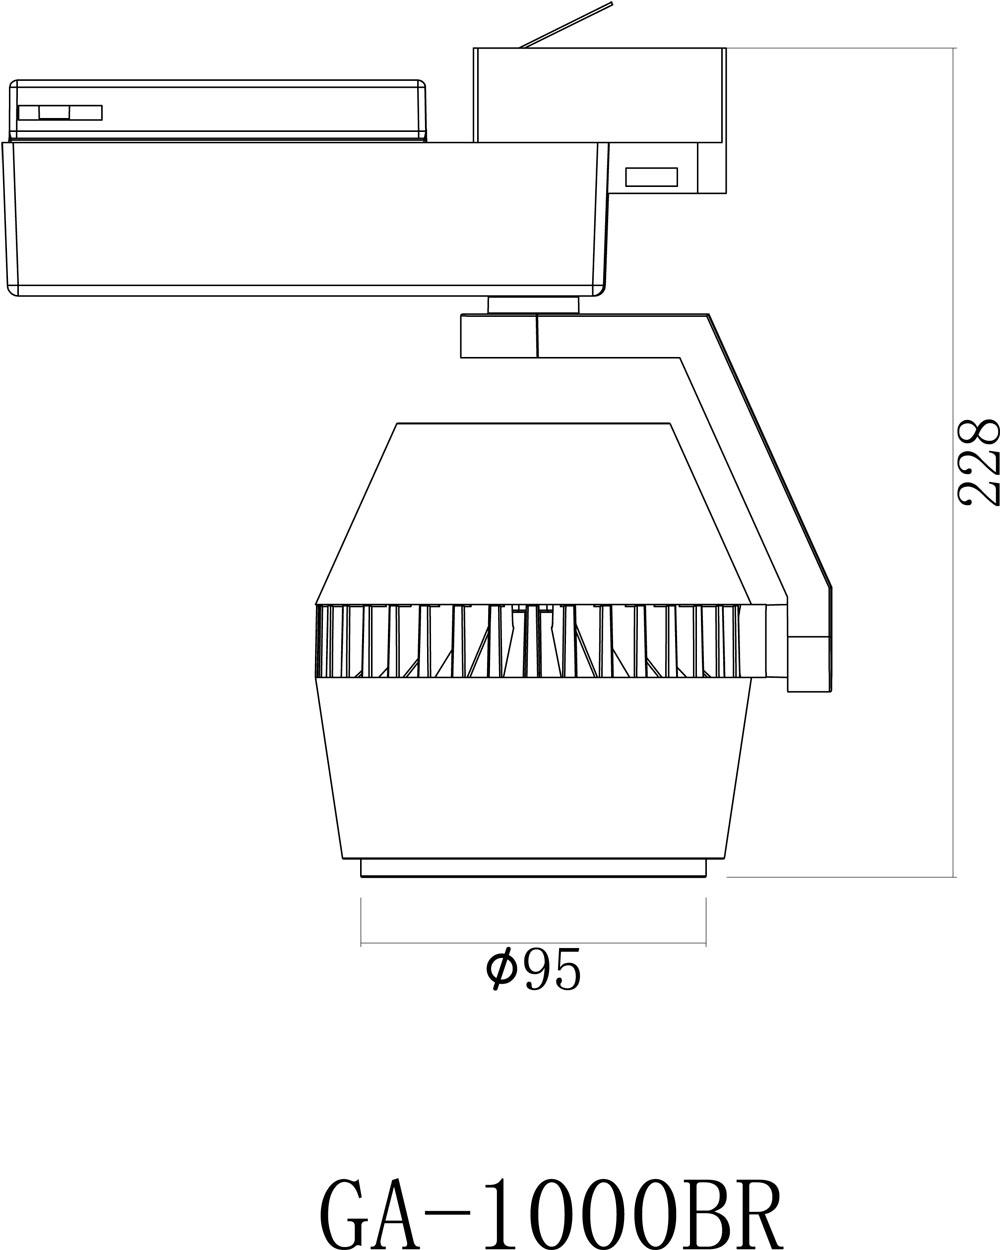 GA-1000BR-尺寸图.jpg